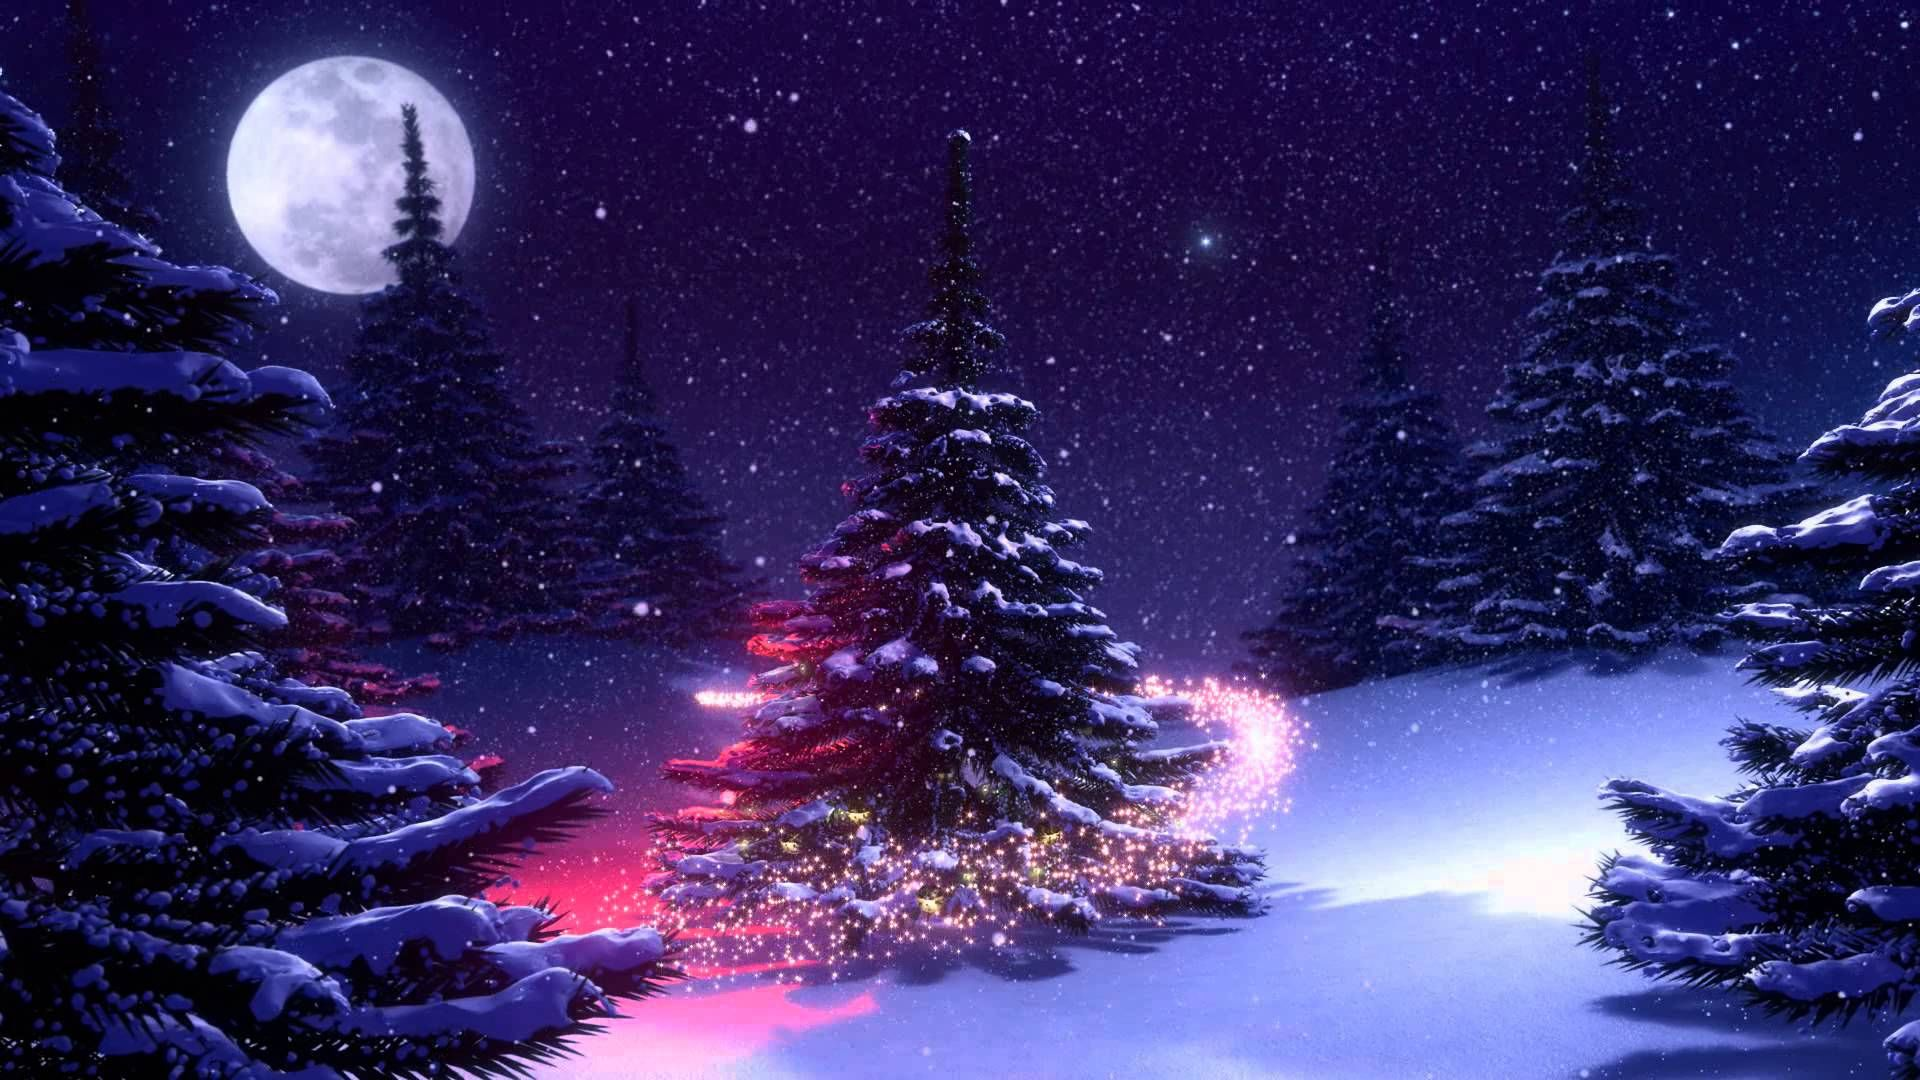 Fondos animados rbol de navidad nieve full hd animated - Arbol navidad nieve ...